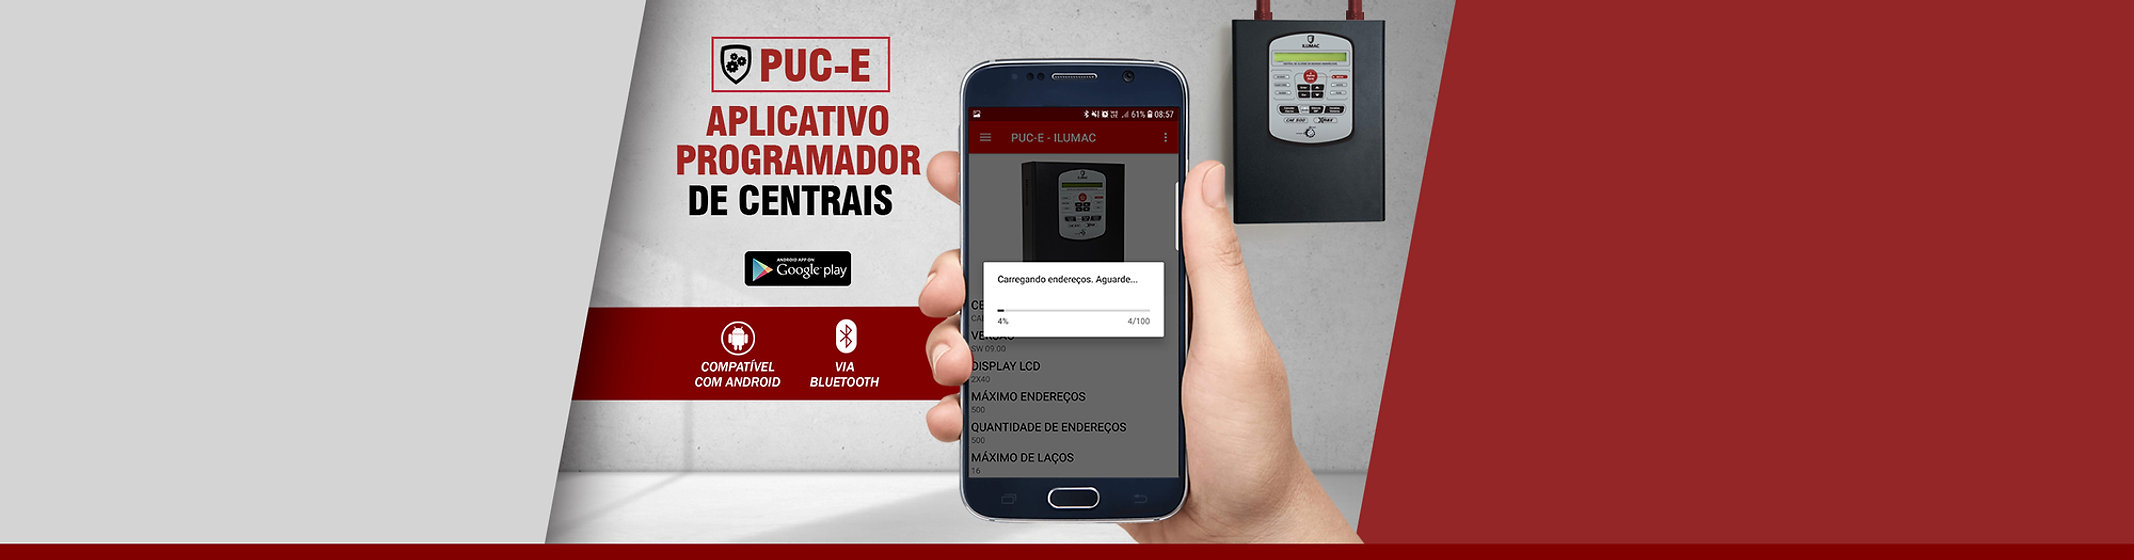 banner-site-PUC-app.jpg